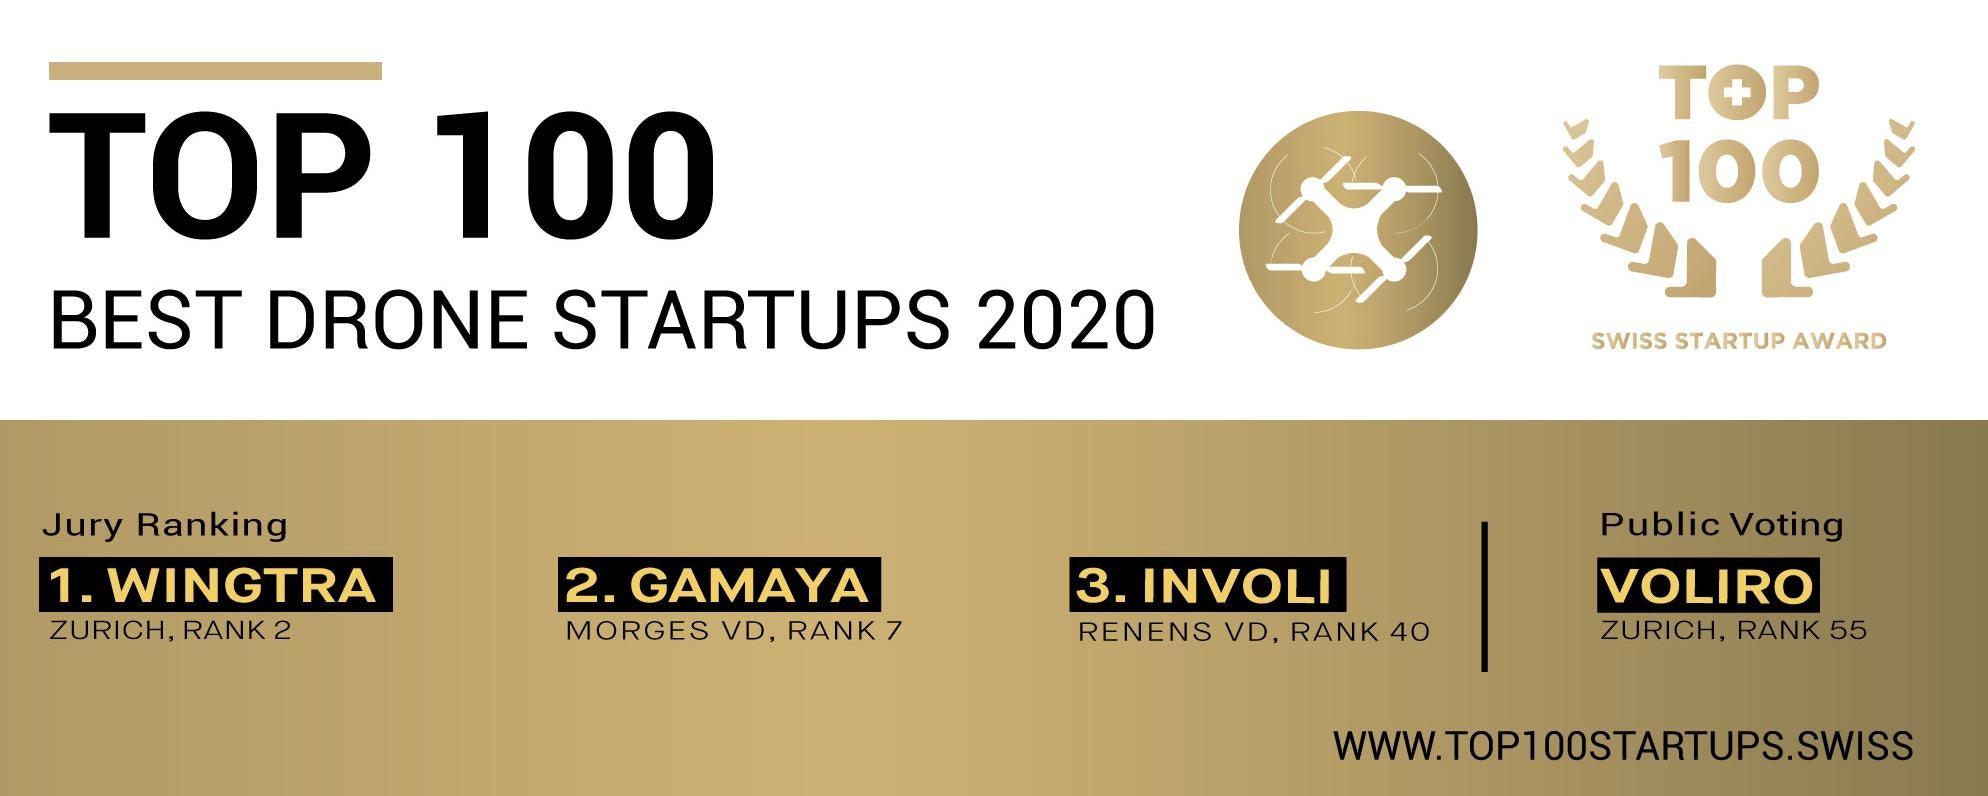 Switzerland's TOP drone startups 2020